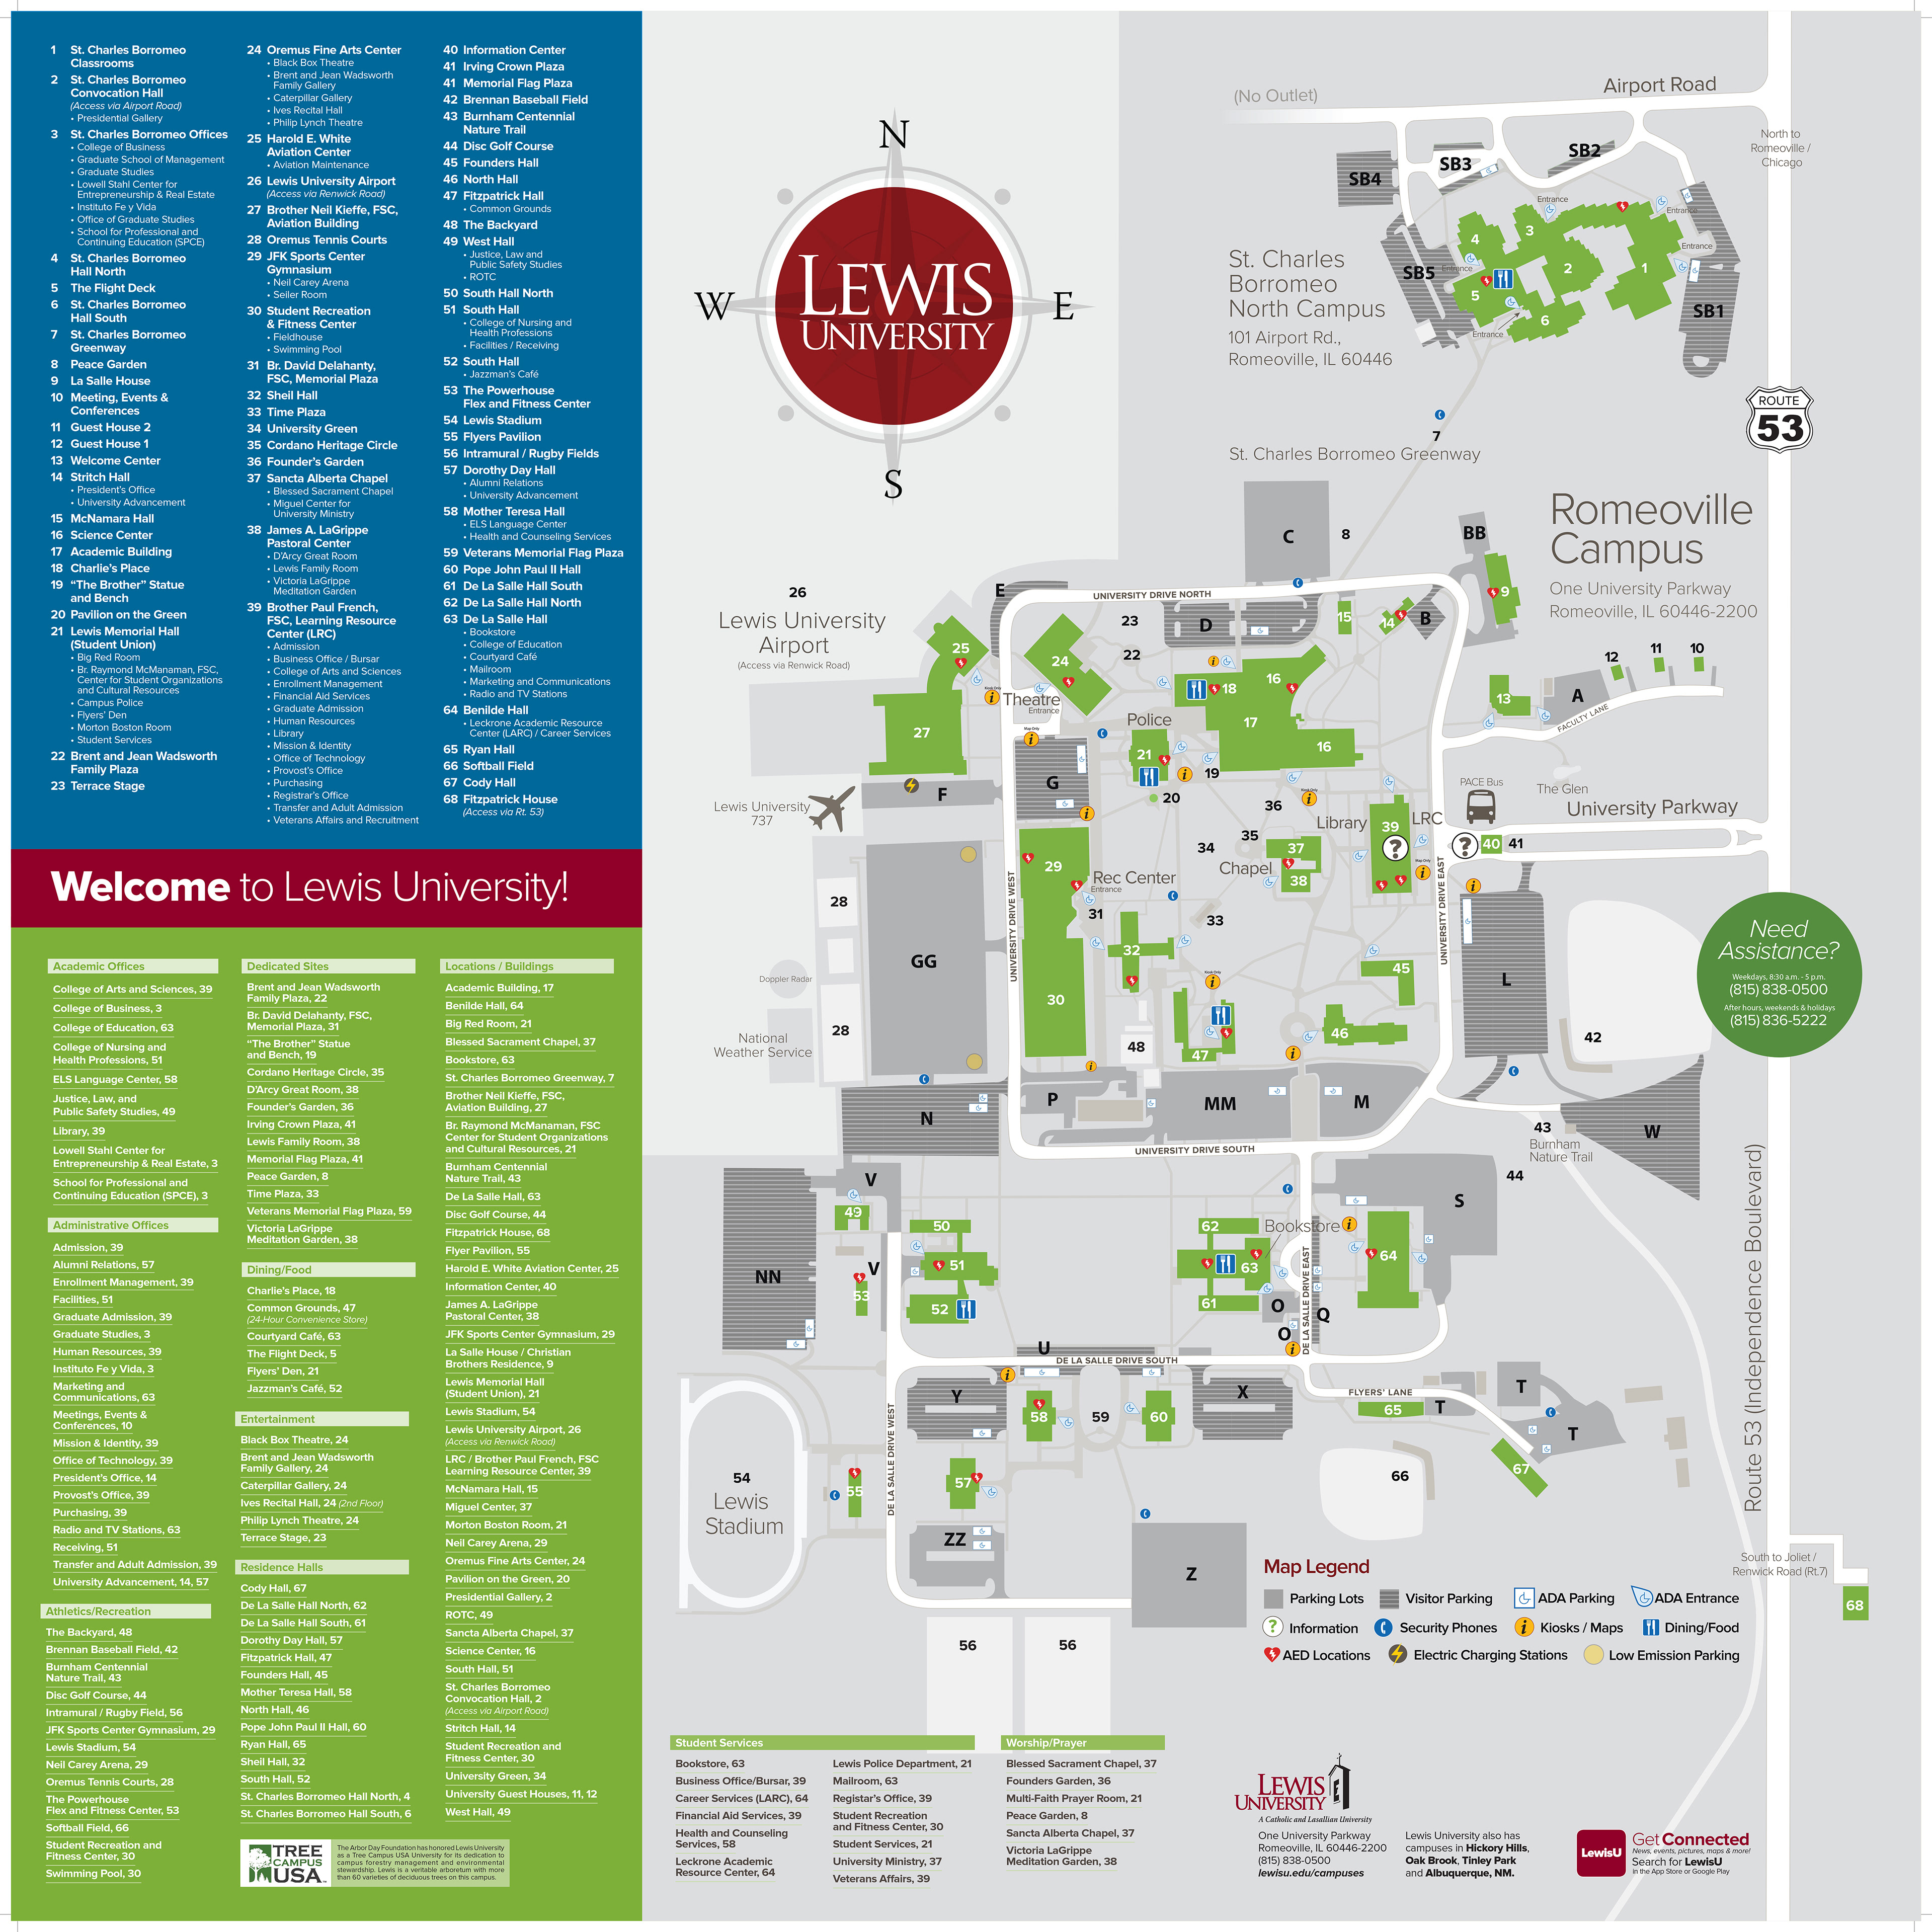 Natasha Zougras - Campus Map/Kiosk Map